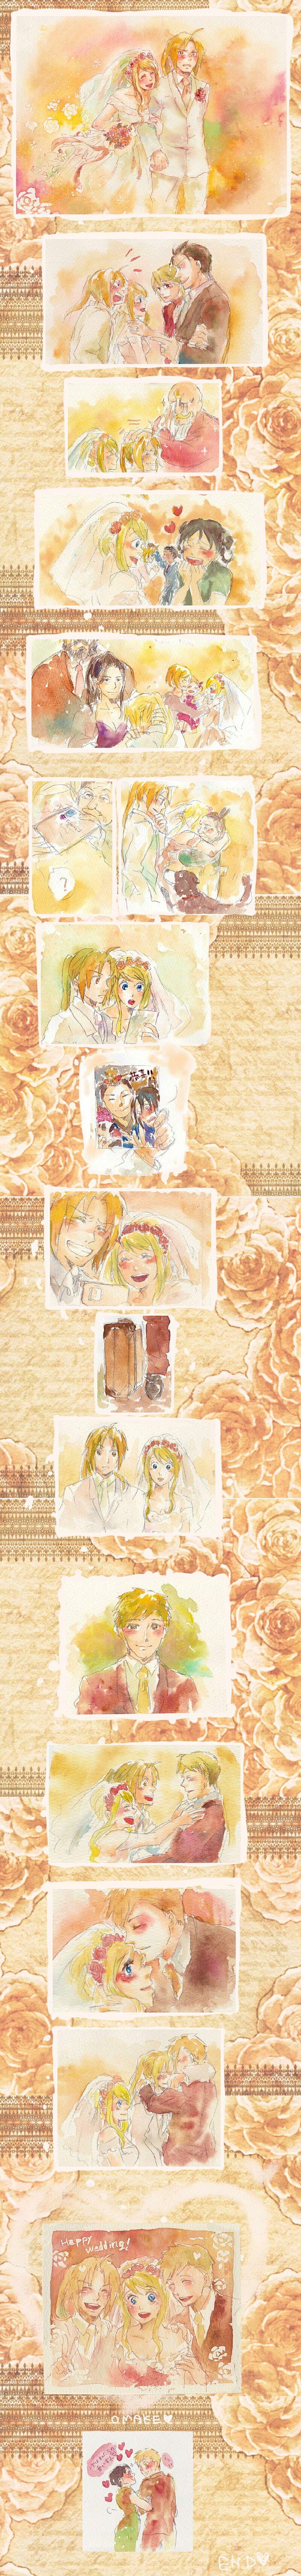 Fullmetal Wedding (Fullmetal Alchemist: Brotherhood)